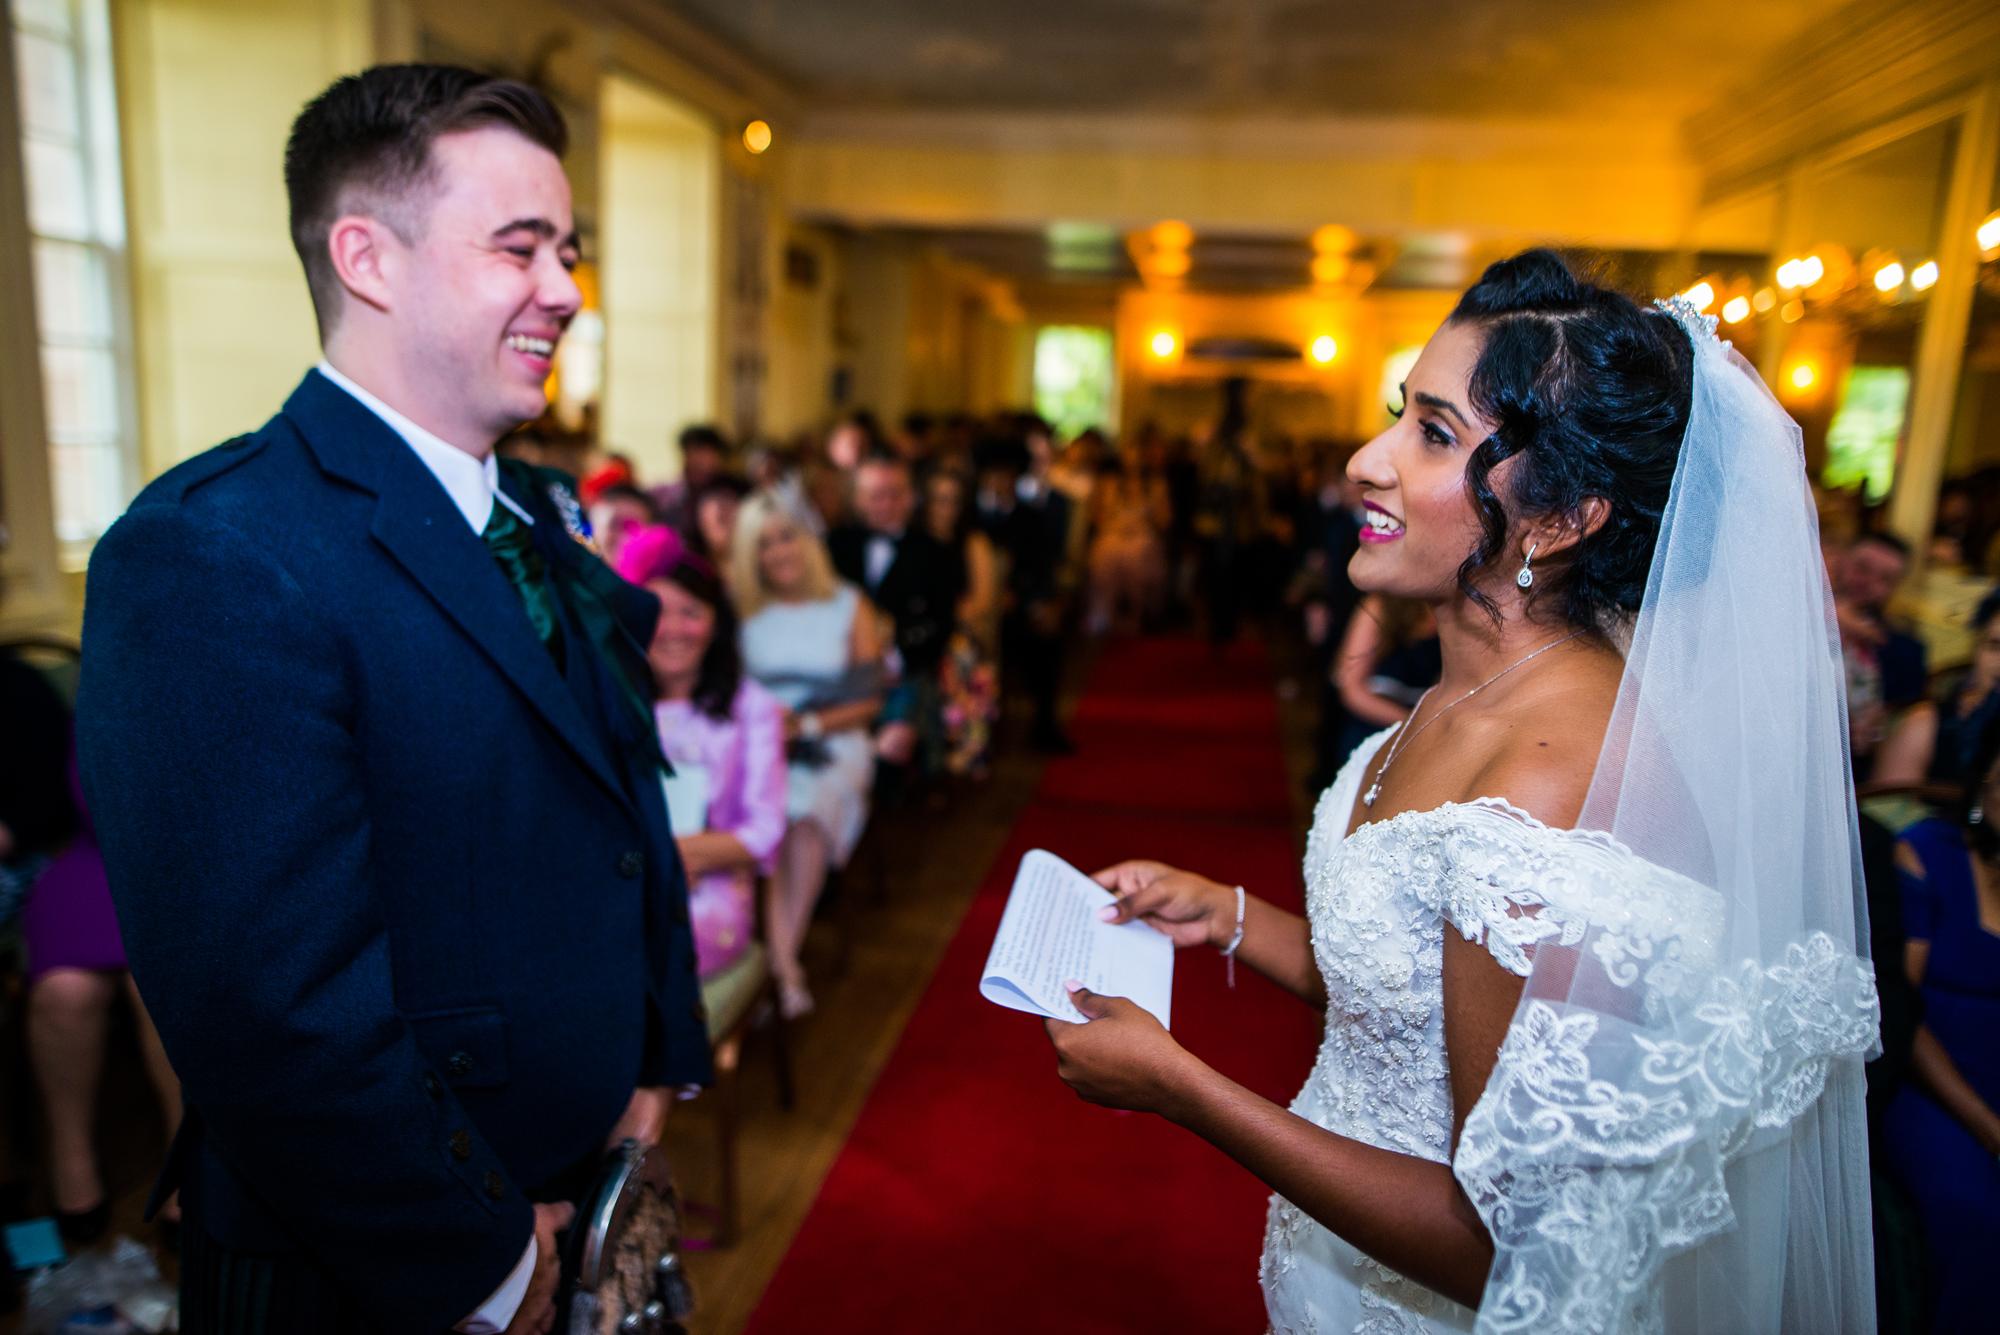 Kev and Shrabani wedding photos (147 of 350).jpg